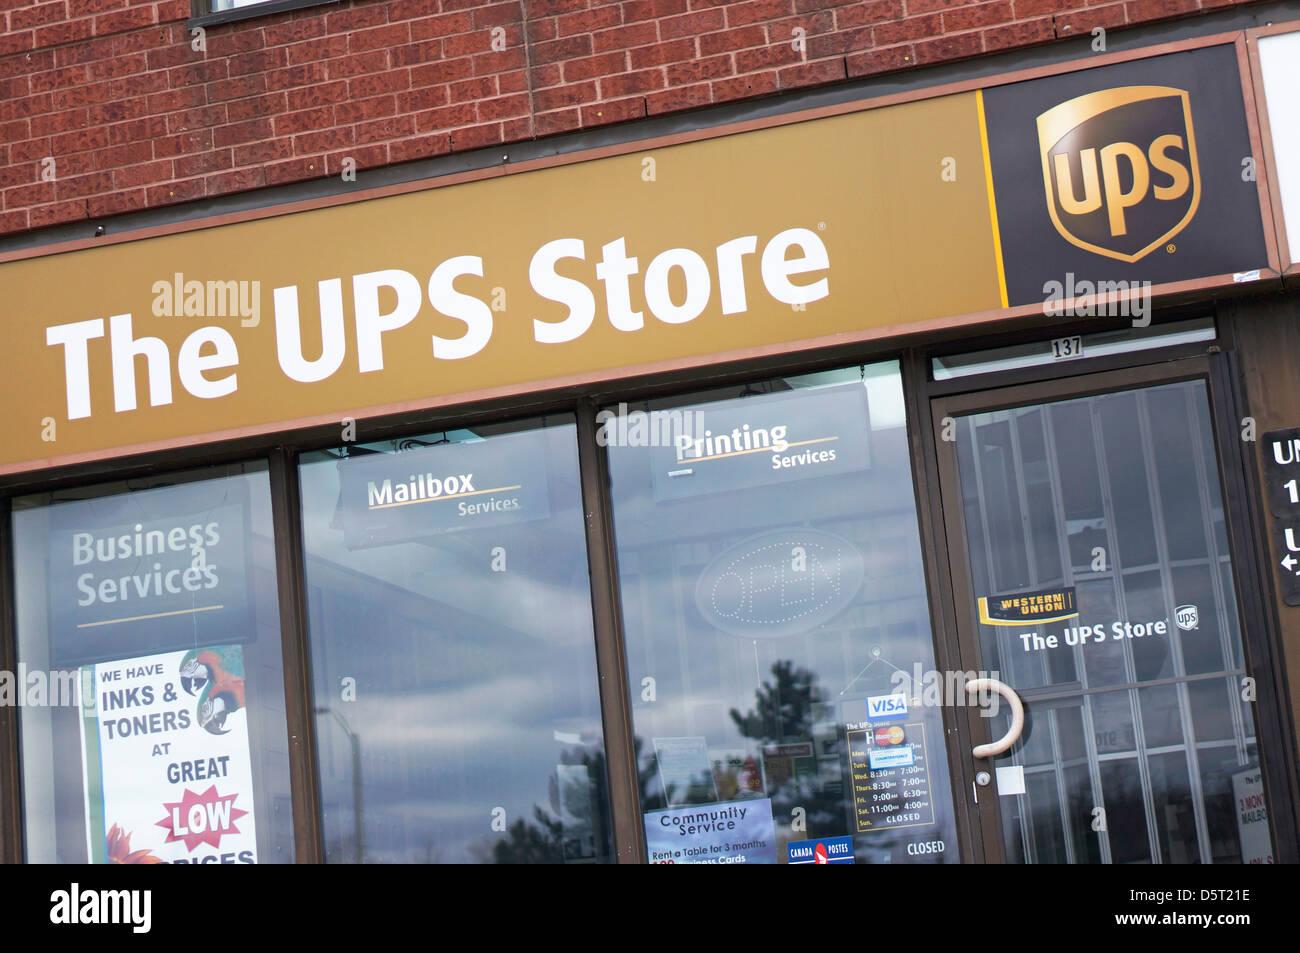 UPS, United Parcel Service Store Stockbild